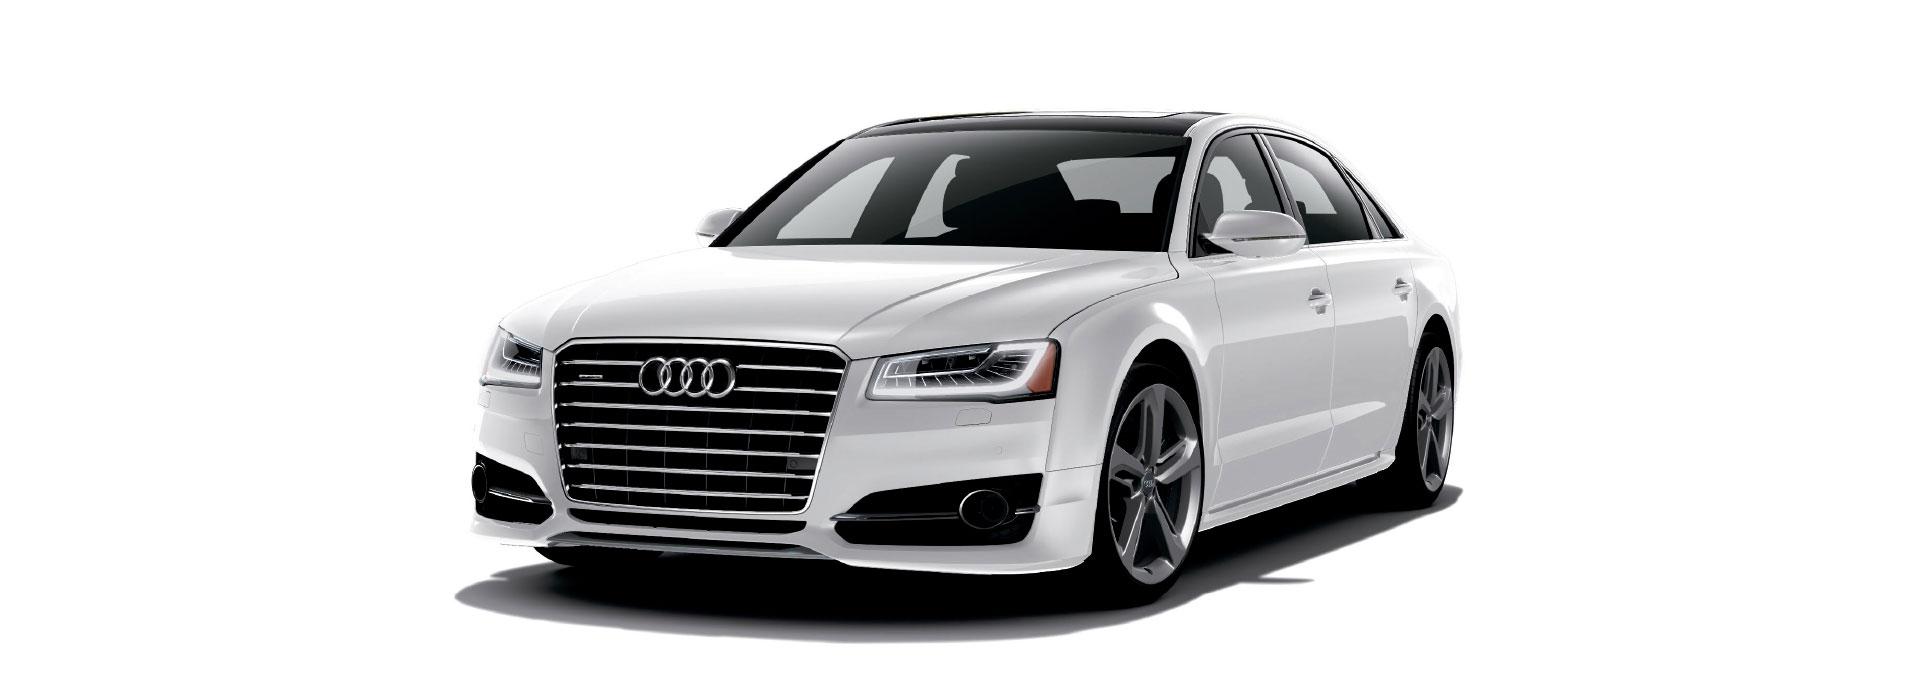 Audi A8 L Sedan 2015